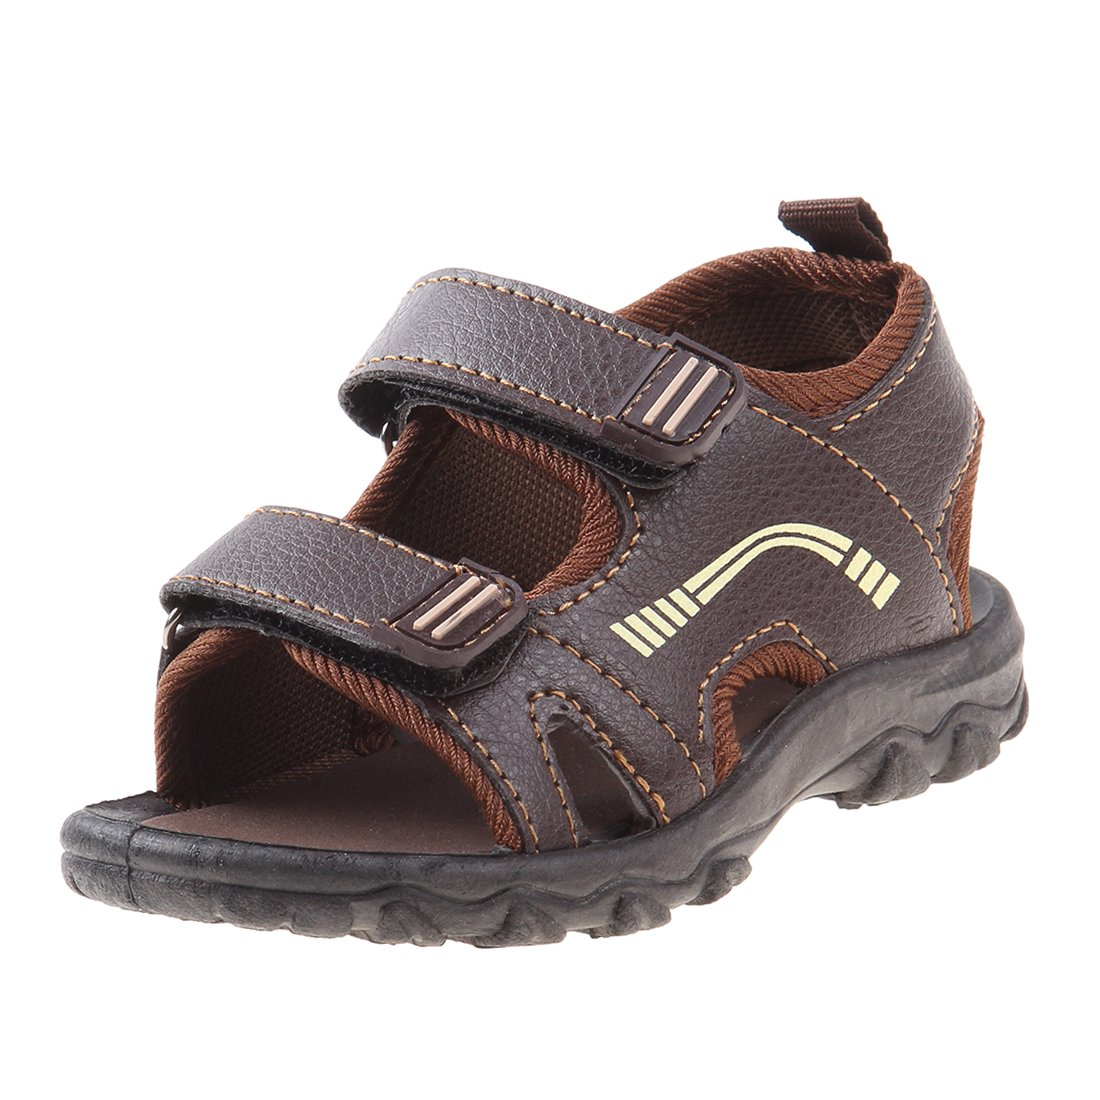 Josmo Boys Outdoor Summer Sandal (Toddler, Little Kid, Big Kid), Brown, 5 M US Toddler'